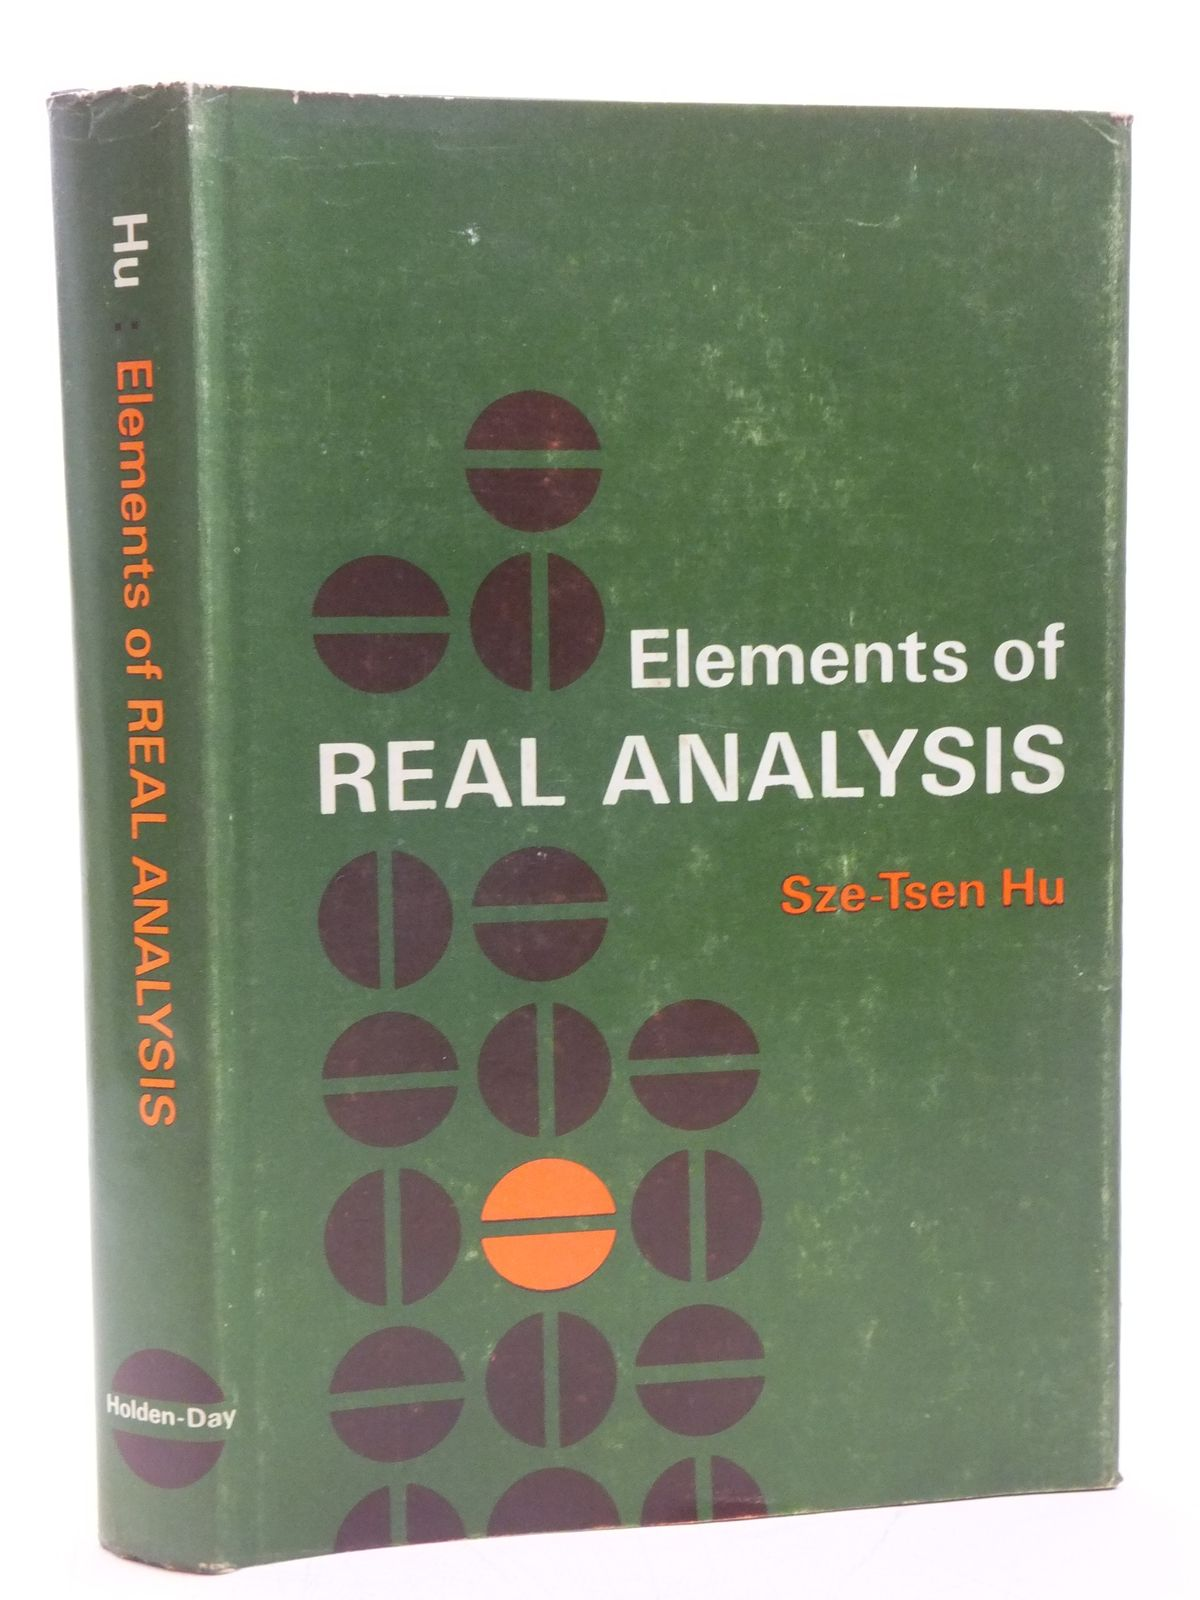 ELEMENTS OF REAL ANALYSIS written by Hu, Sze-Tsen, STOCK CODE